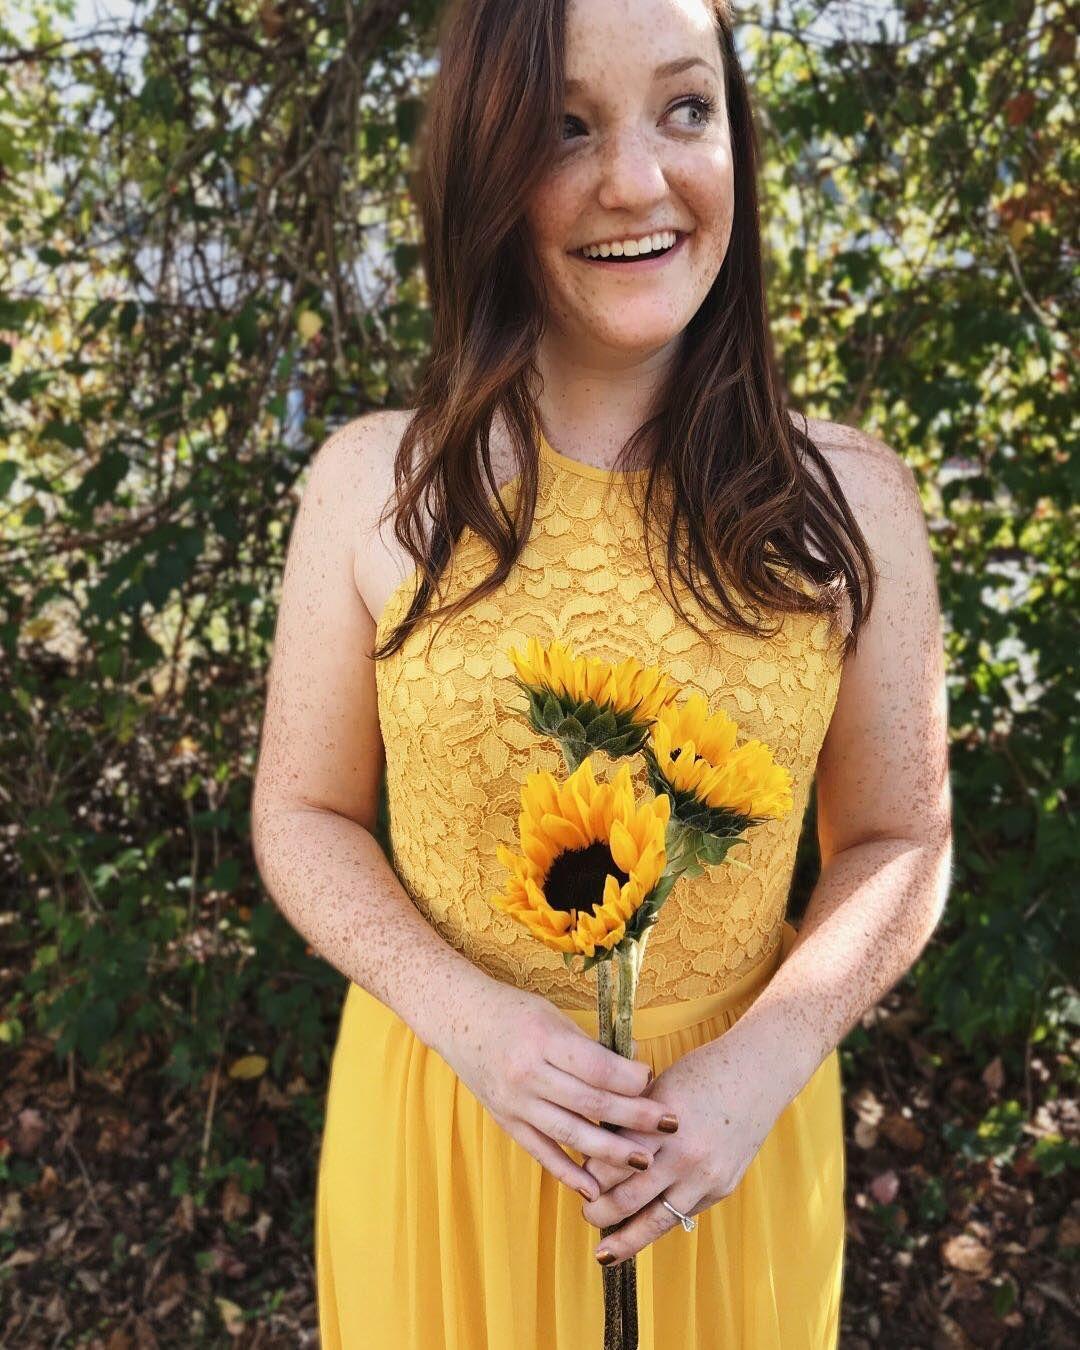 New Color Alert Sunflower David S Bridal Blog Mesh Bridesmaids Dress Davids Bridal Bridesmaid Dresses Bridesmaid Dressing Gowns [ 1350 x 1080 Pixel ]